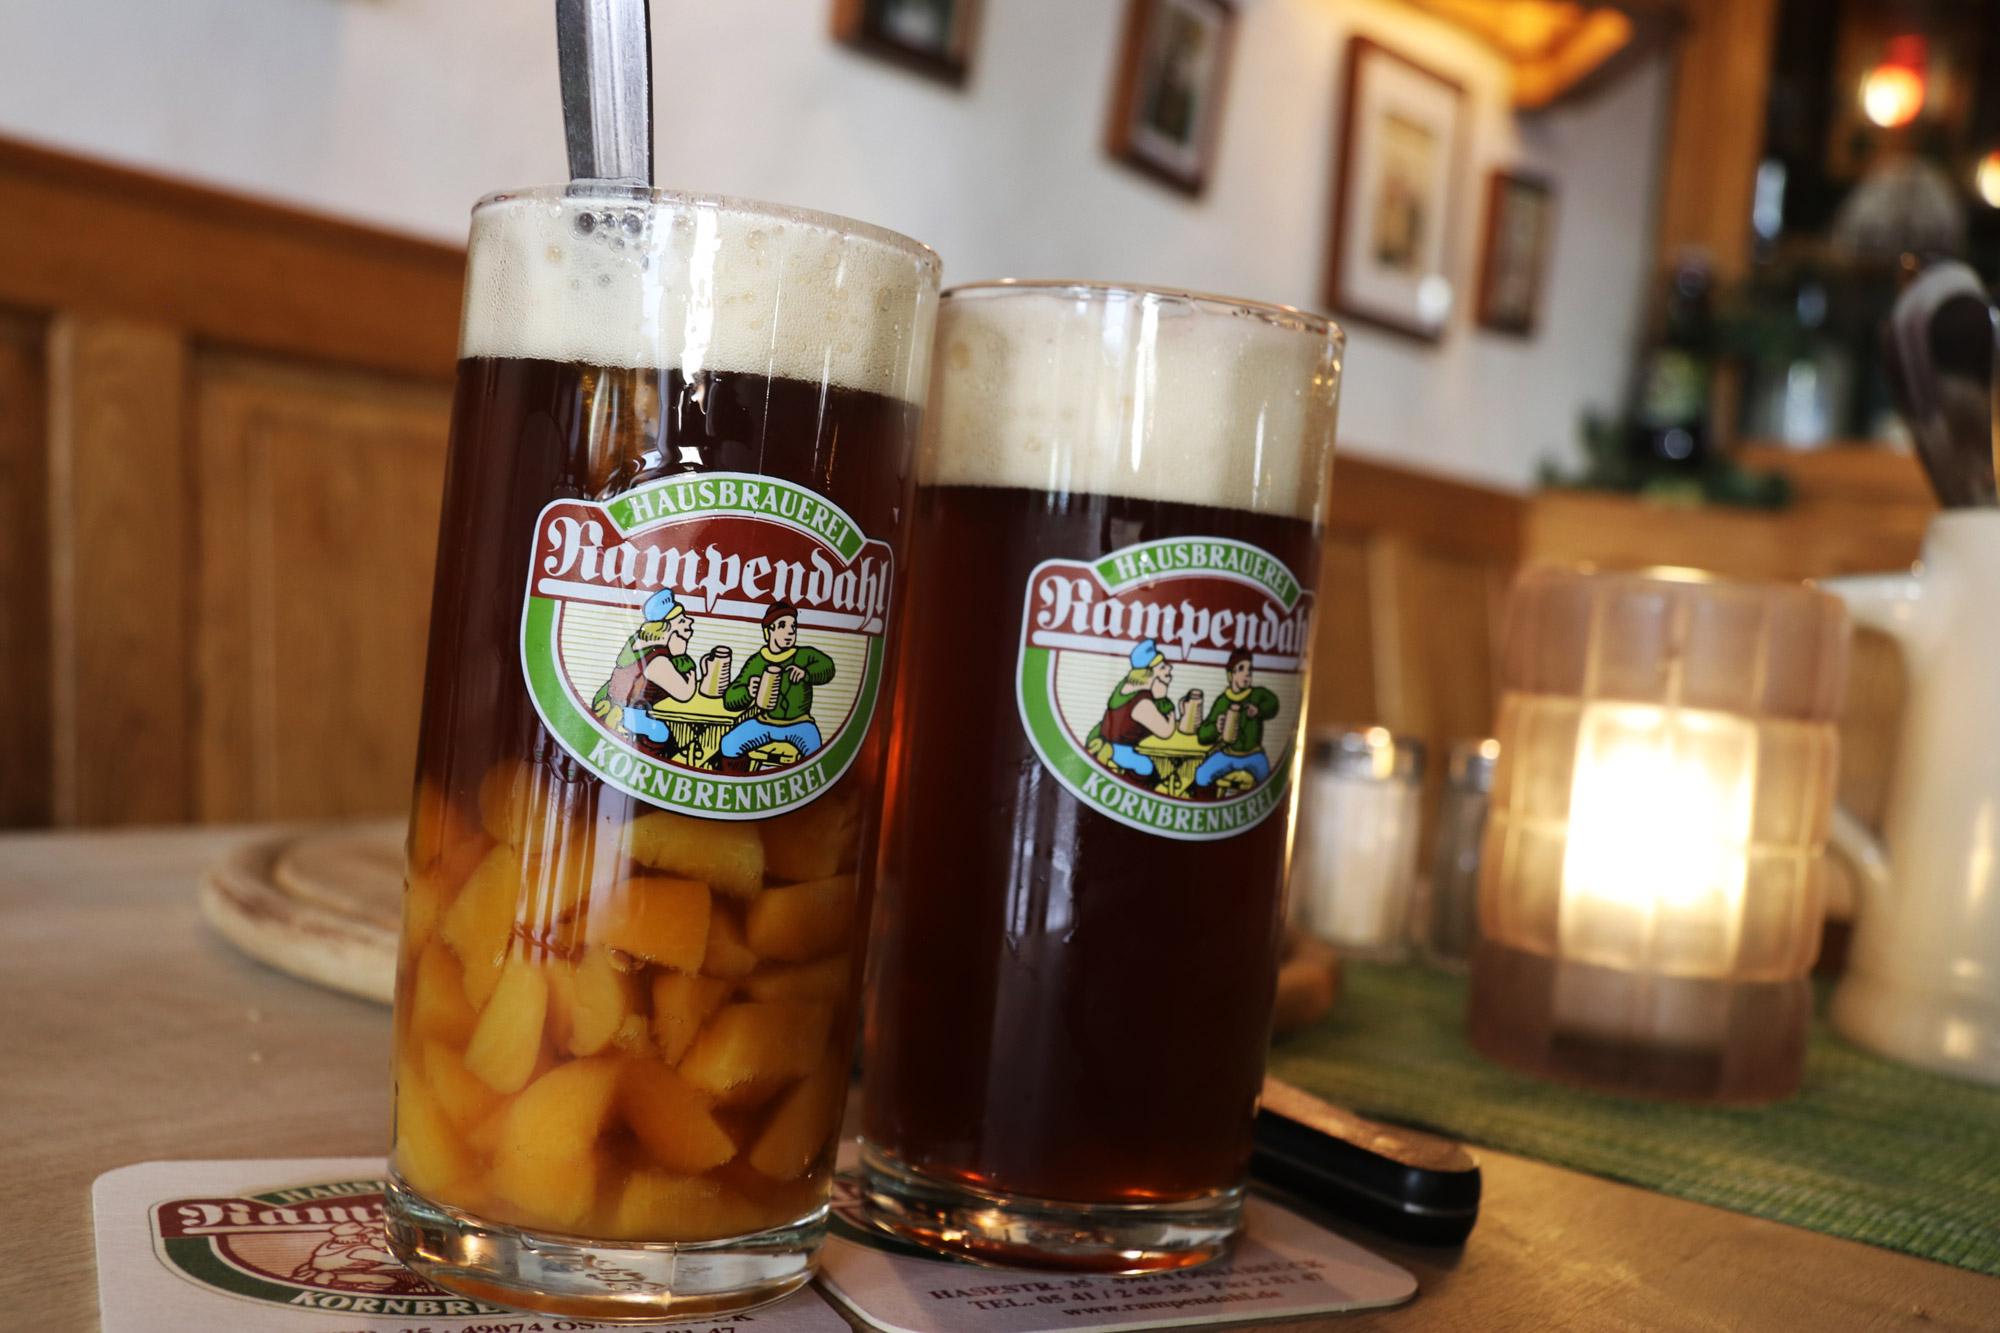 7x doen in Osnabrück - Biertje bij Rampendahl Hausbrauerei